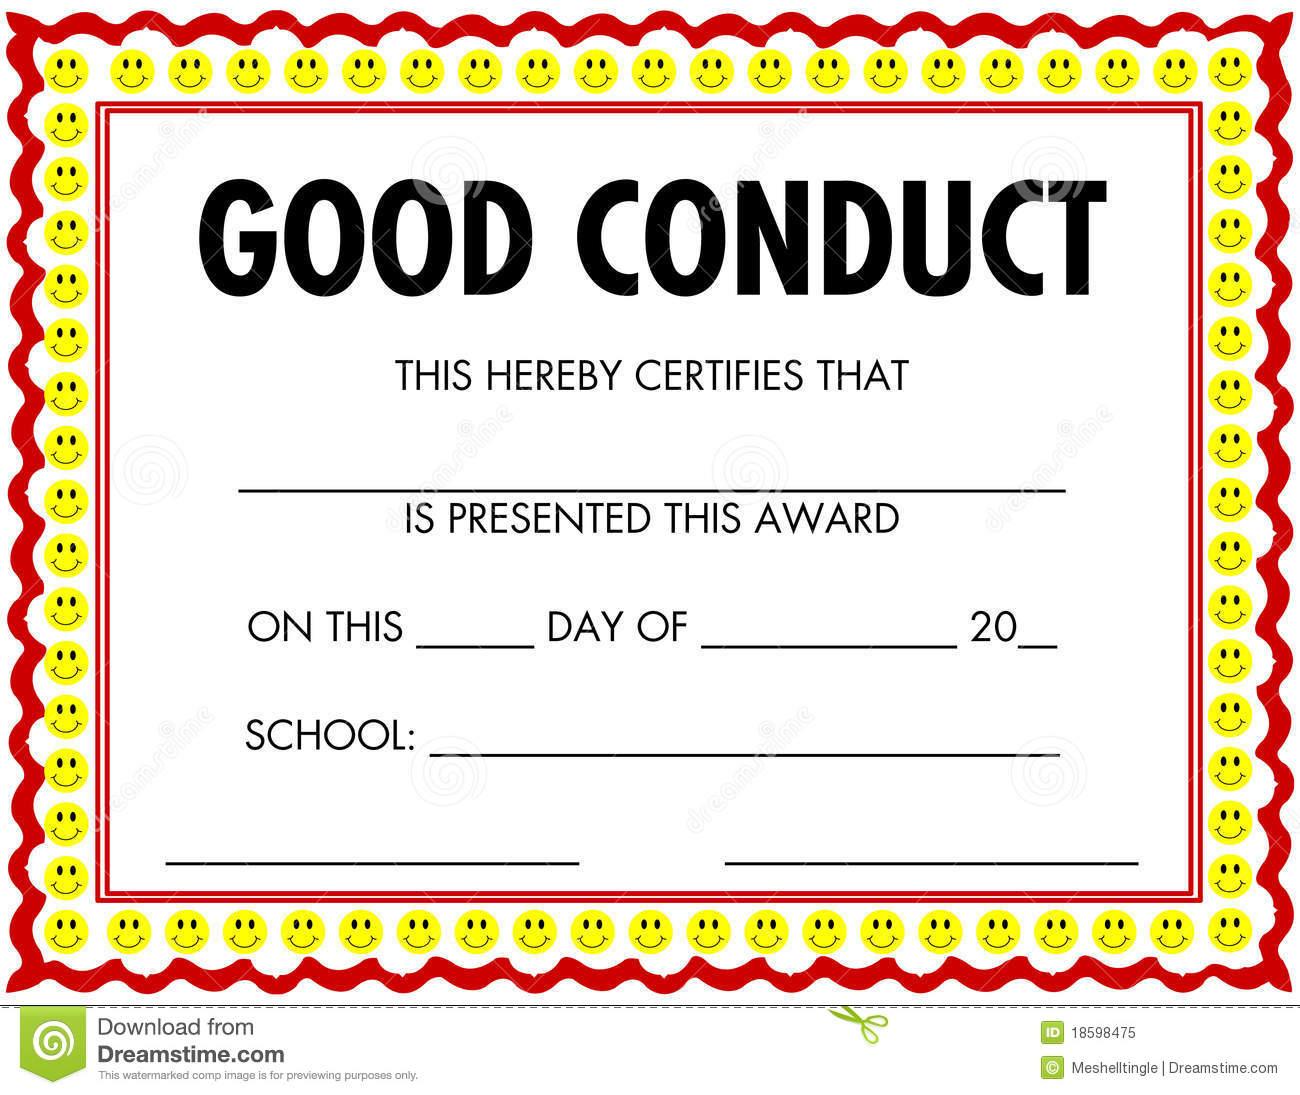 award-certificate-good-conduct-18598475